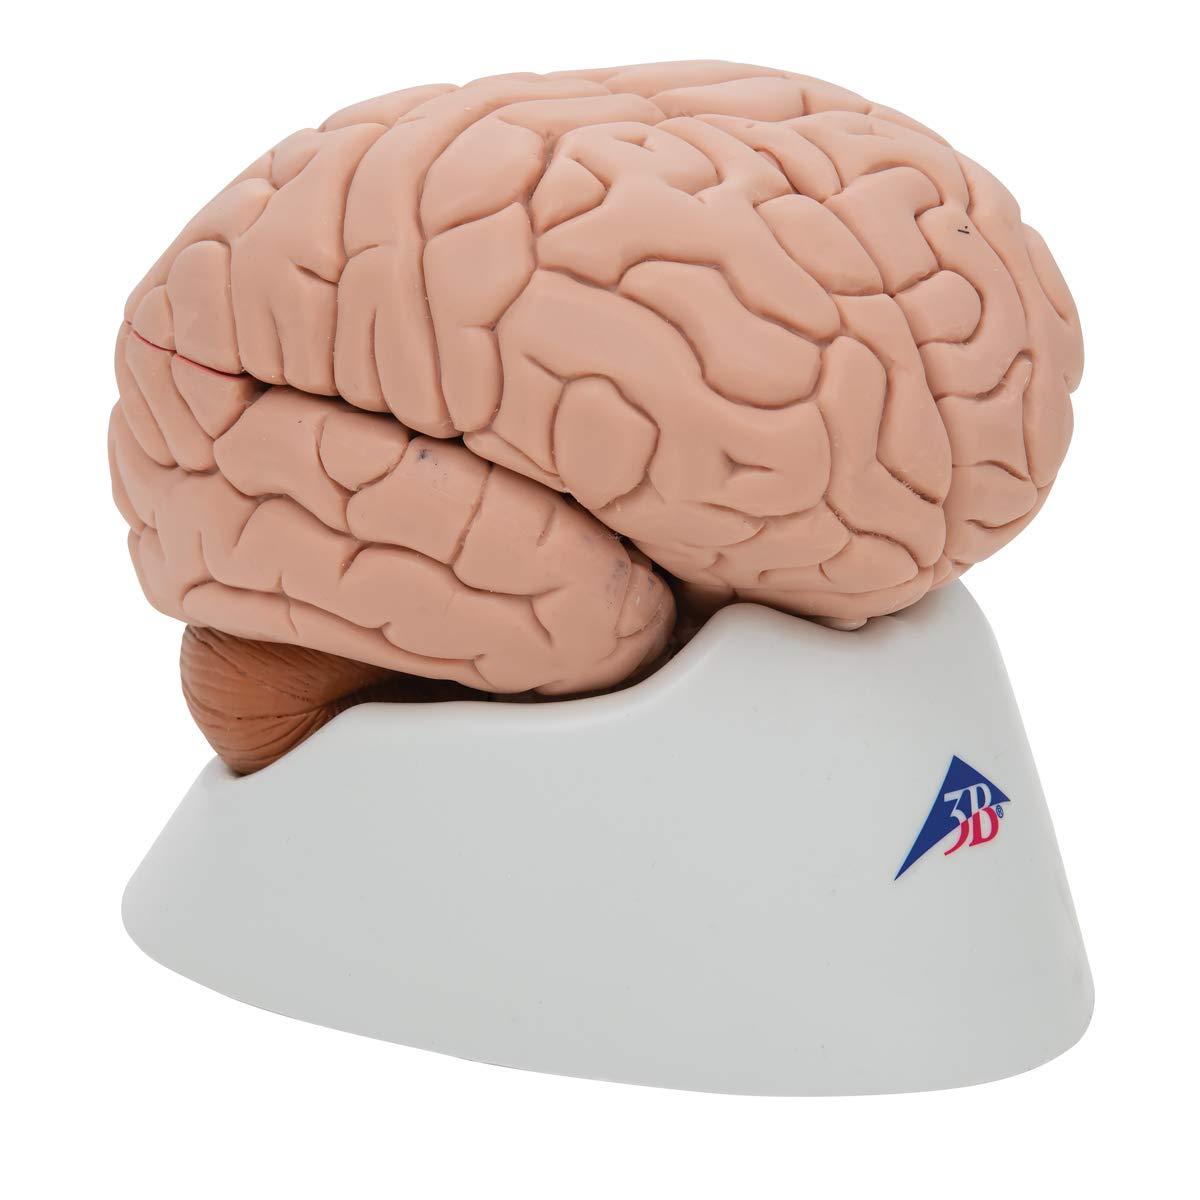 3B Scientific Deluxe 8-Part Brain by 3B Scientific (Image #2)